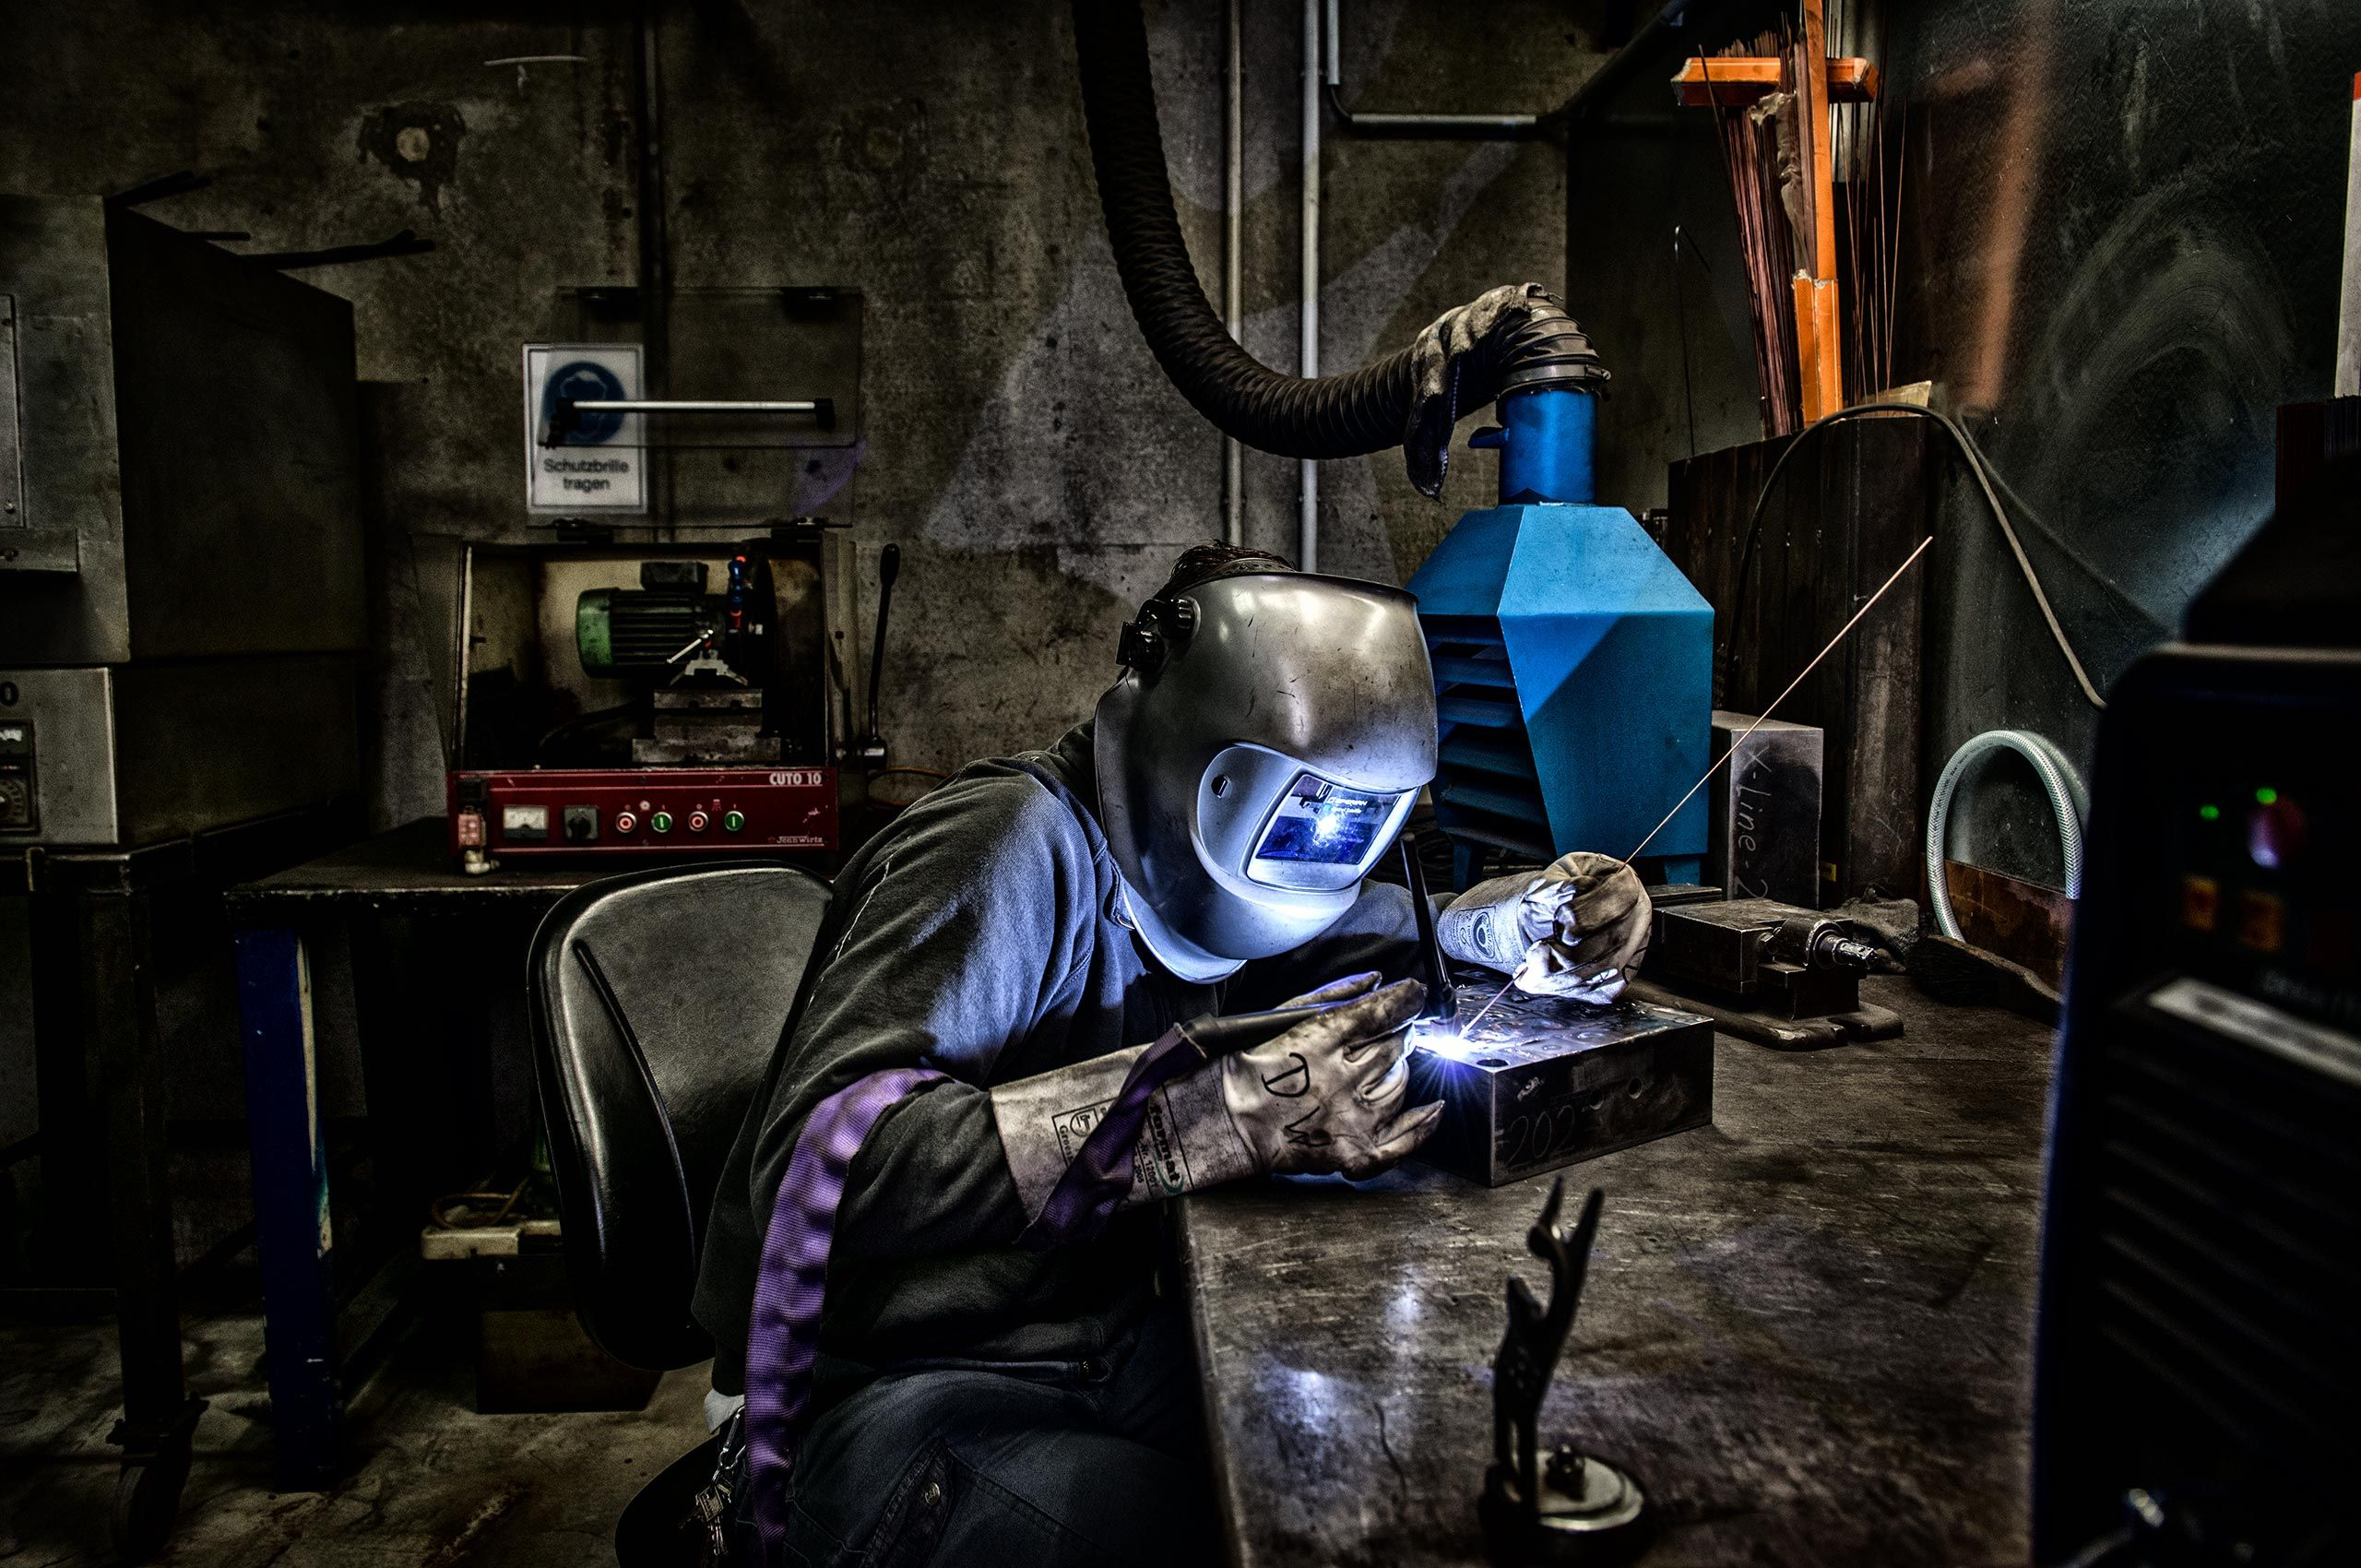 welding-wusthof-factory-HenrikOlundPhotography.jpg